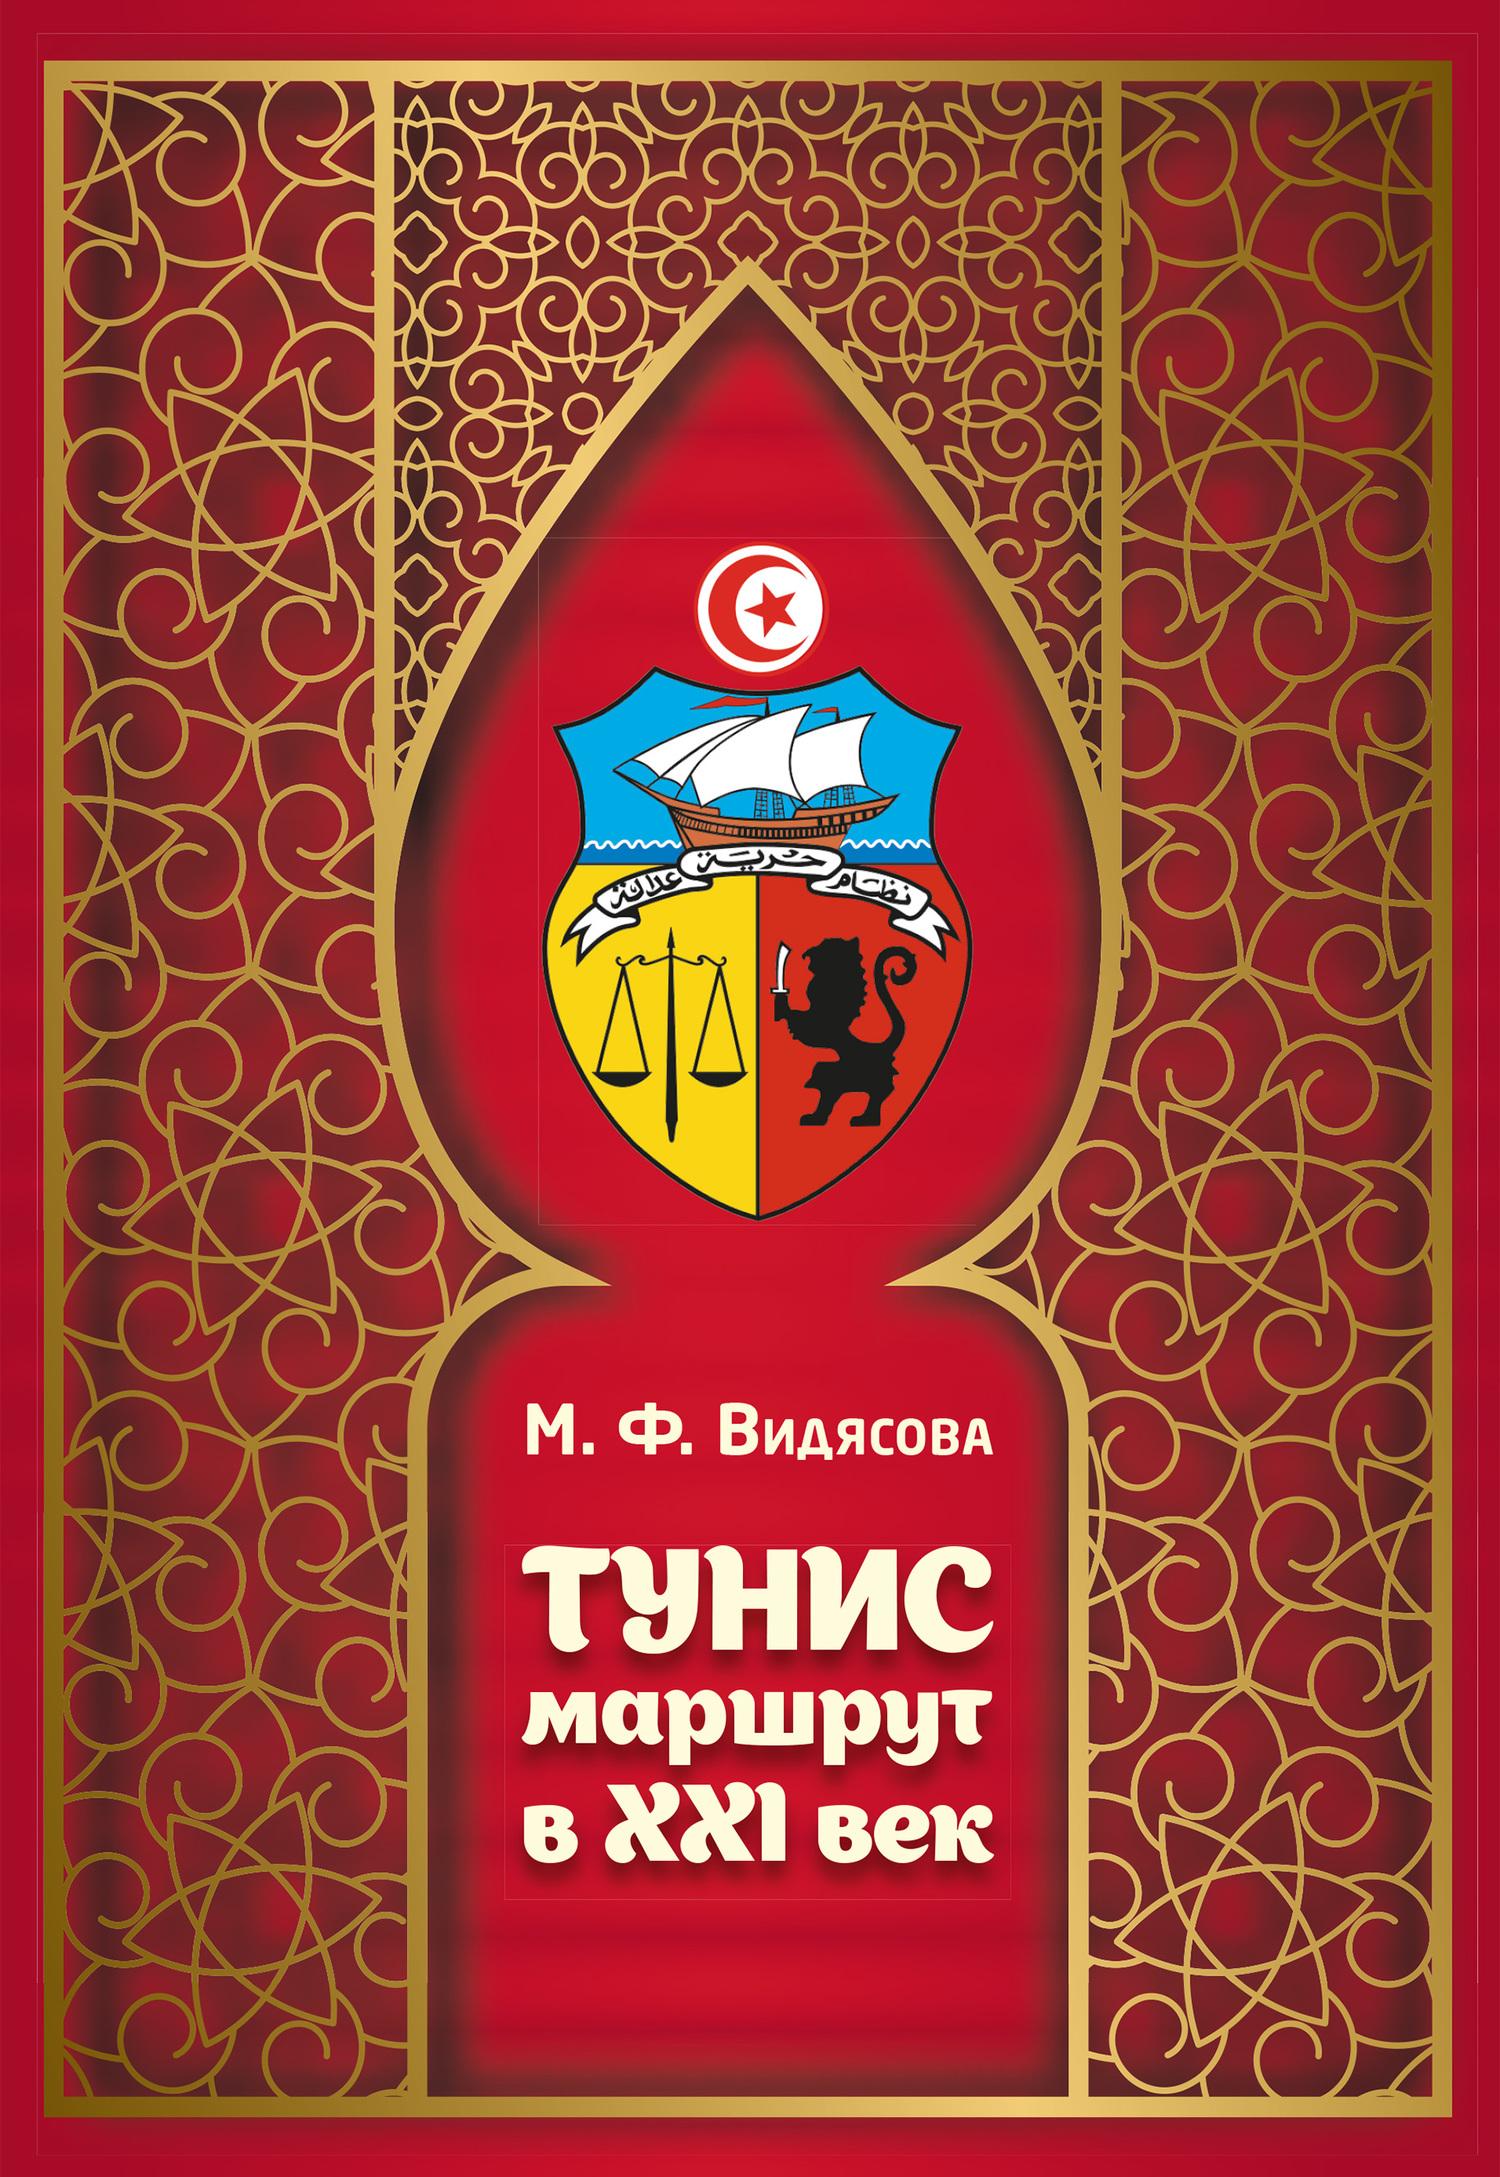 Мария Видясова. Тунис. Маршрут в XXI век